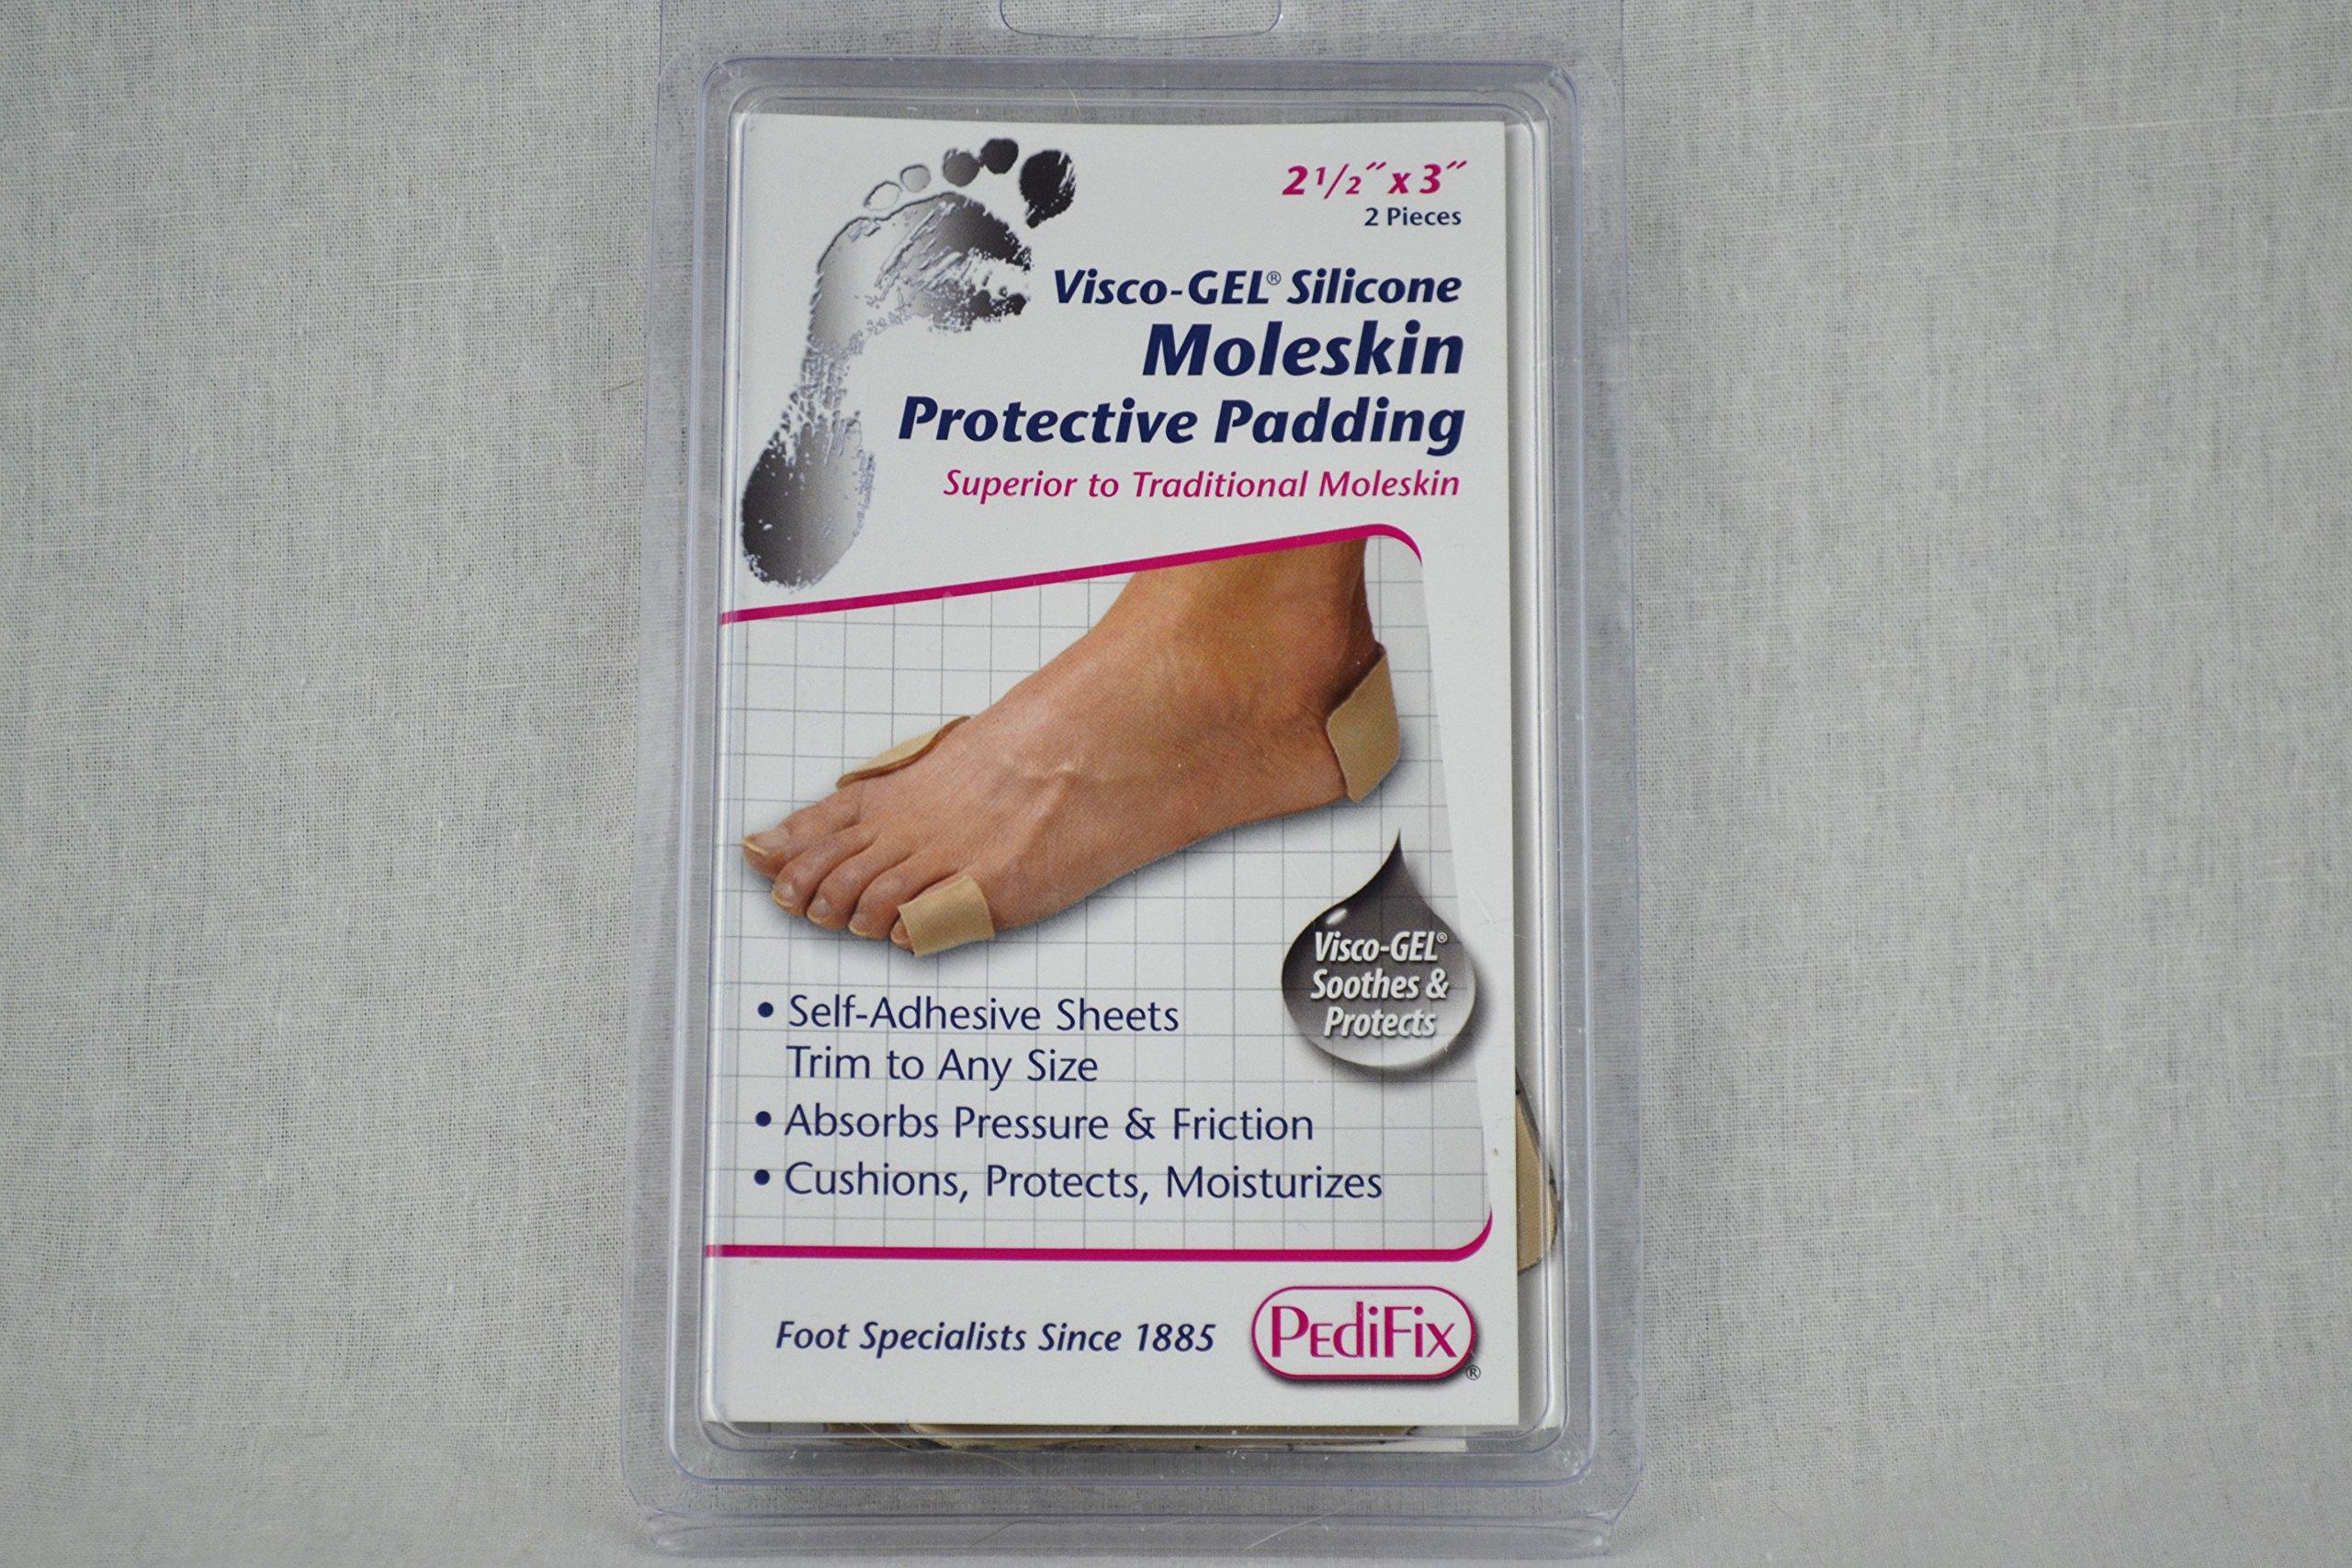 Visco-GEL Gel Moleskin Protective Padding